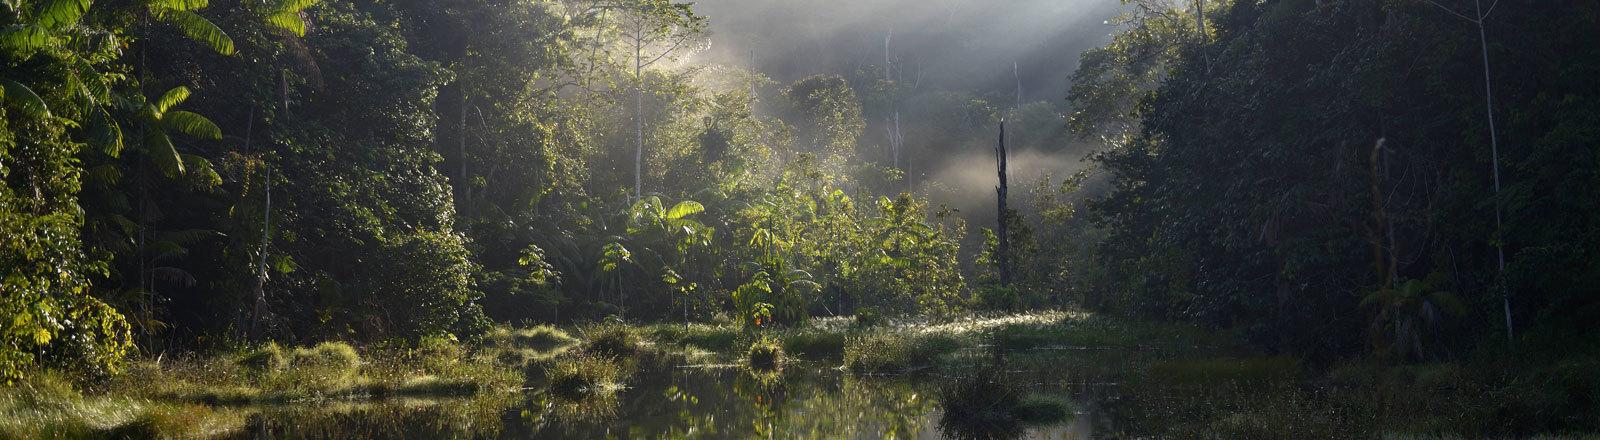 Amazonas-Regenwald in Para, Brasilien